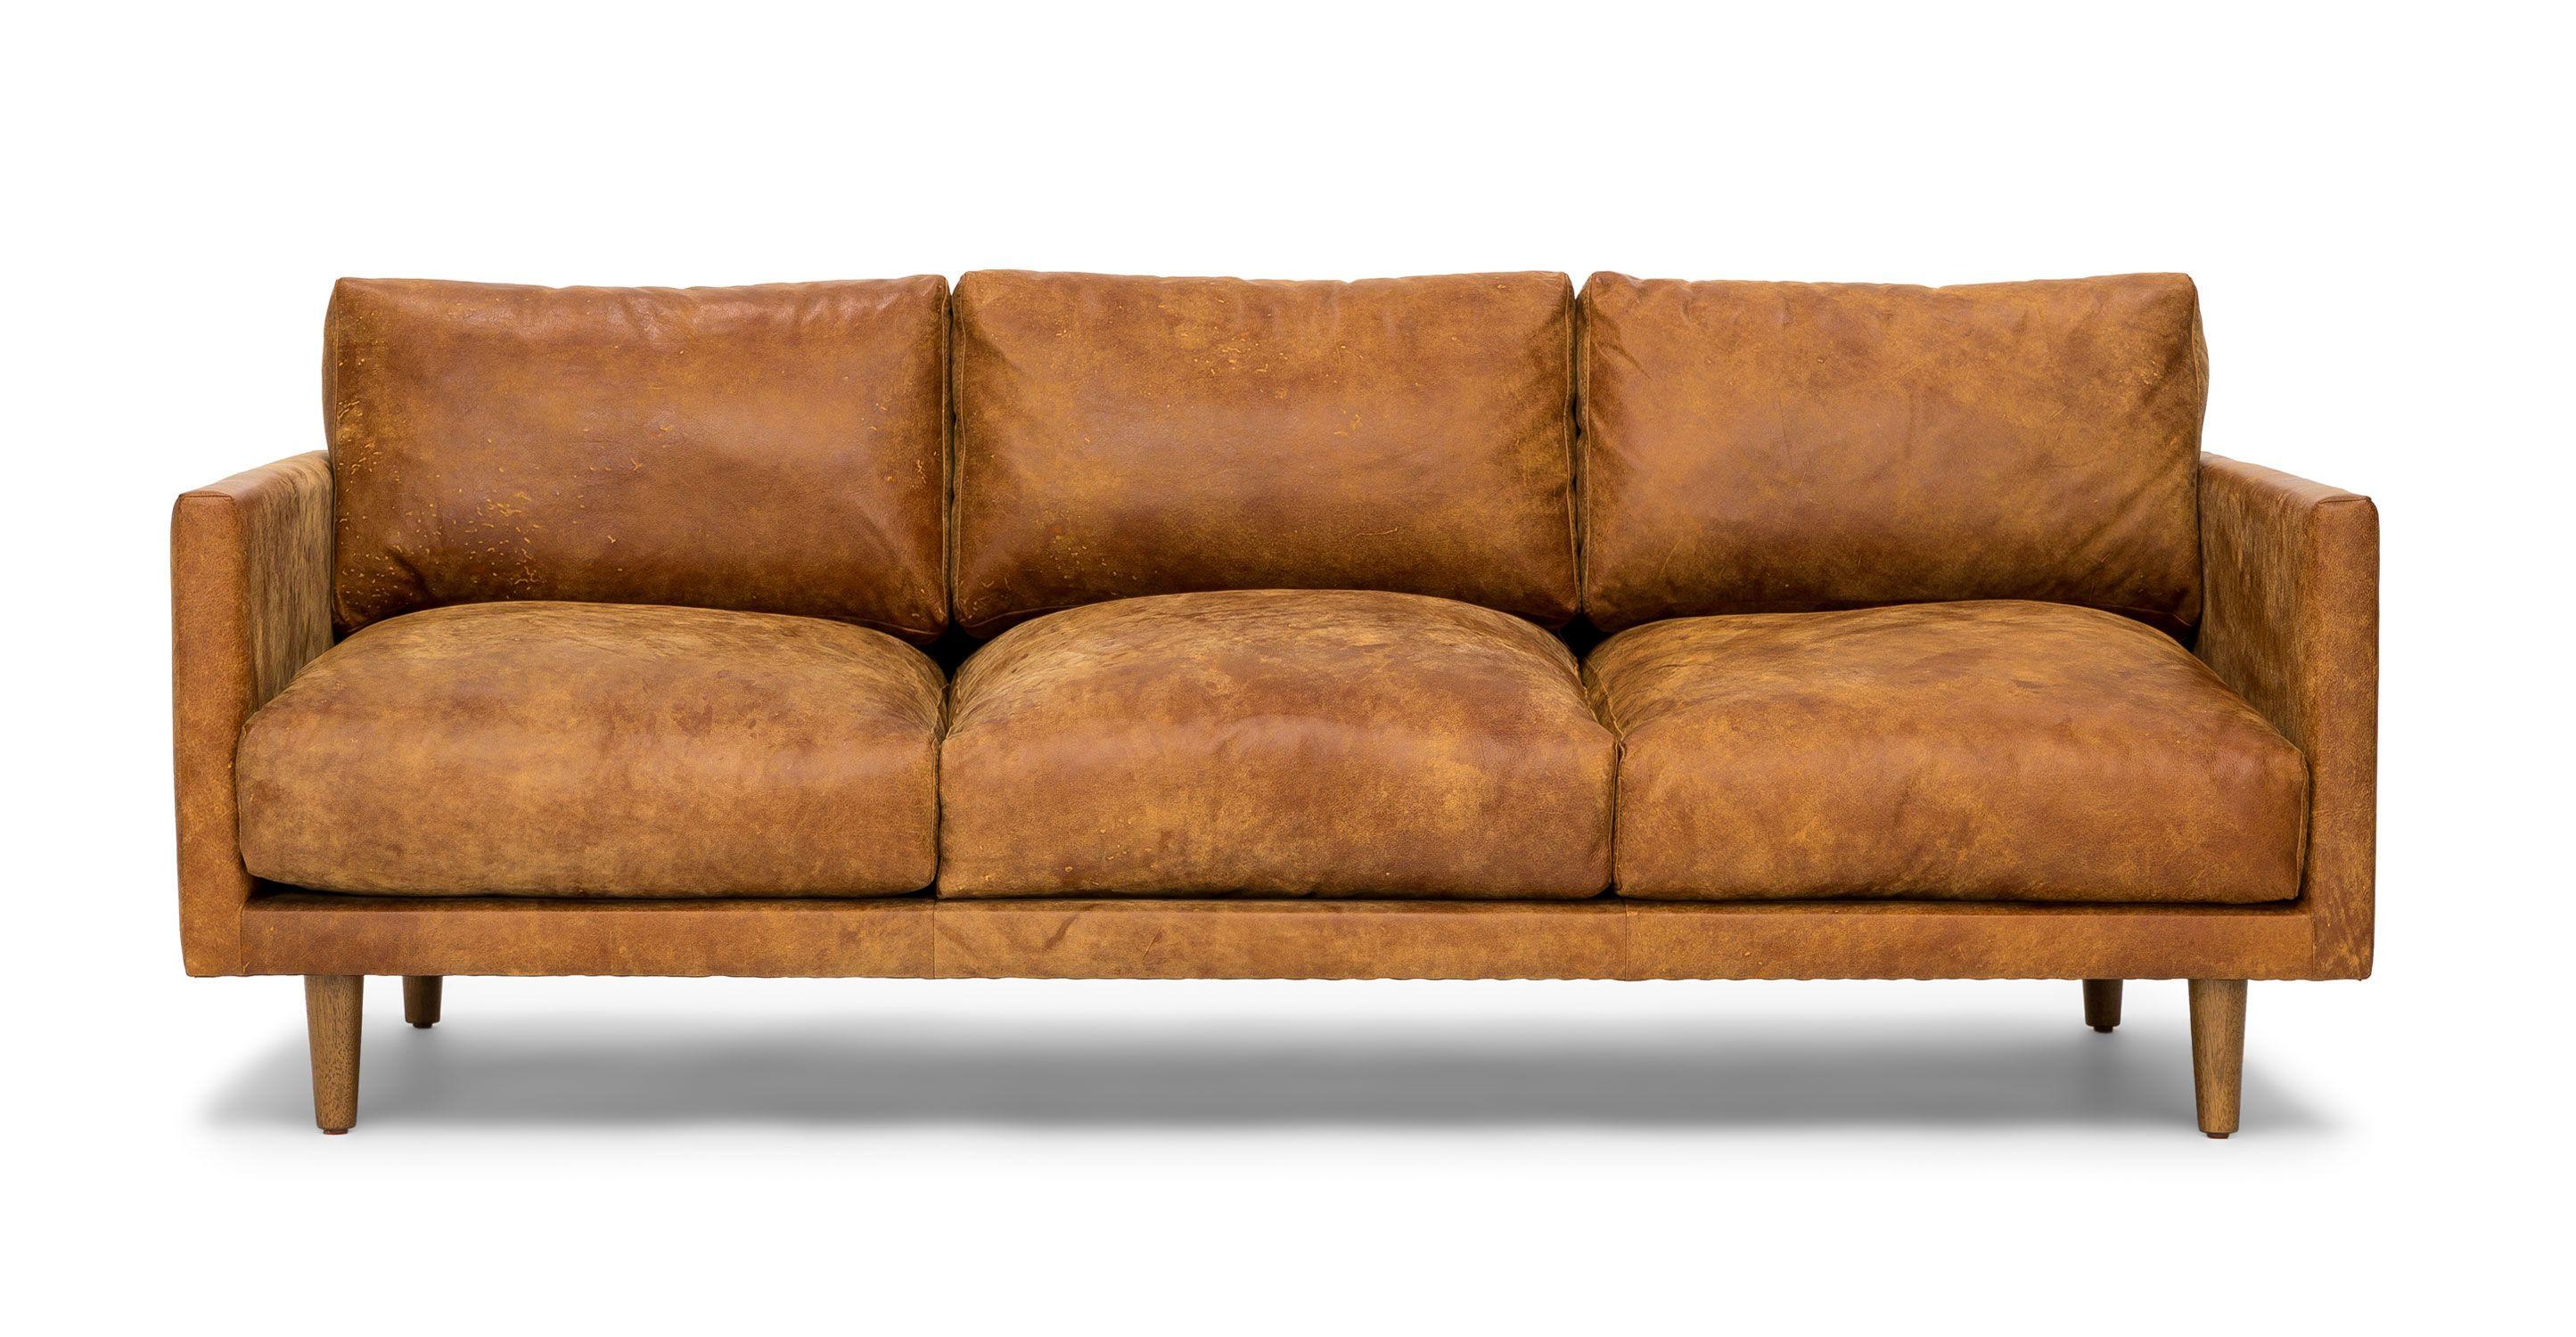 Tan Brown Leather Sofa - Upholstered | Article Nirvana Modern ...